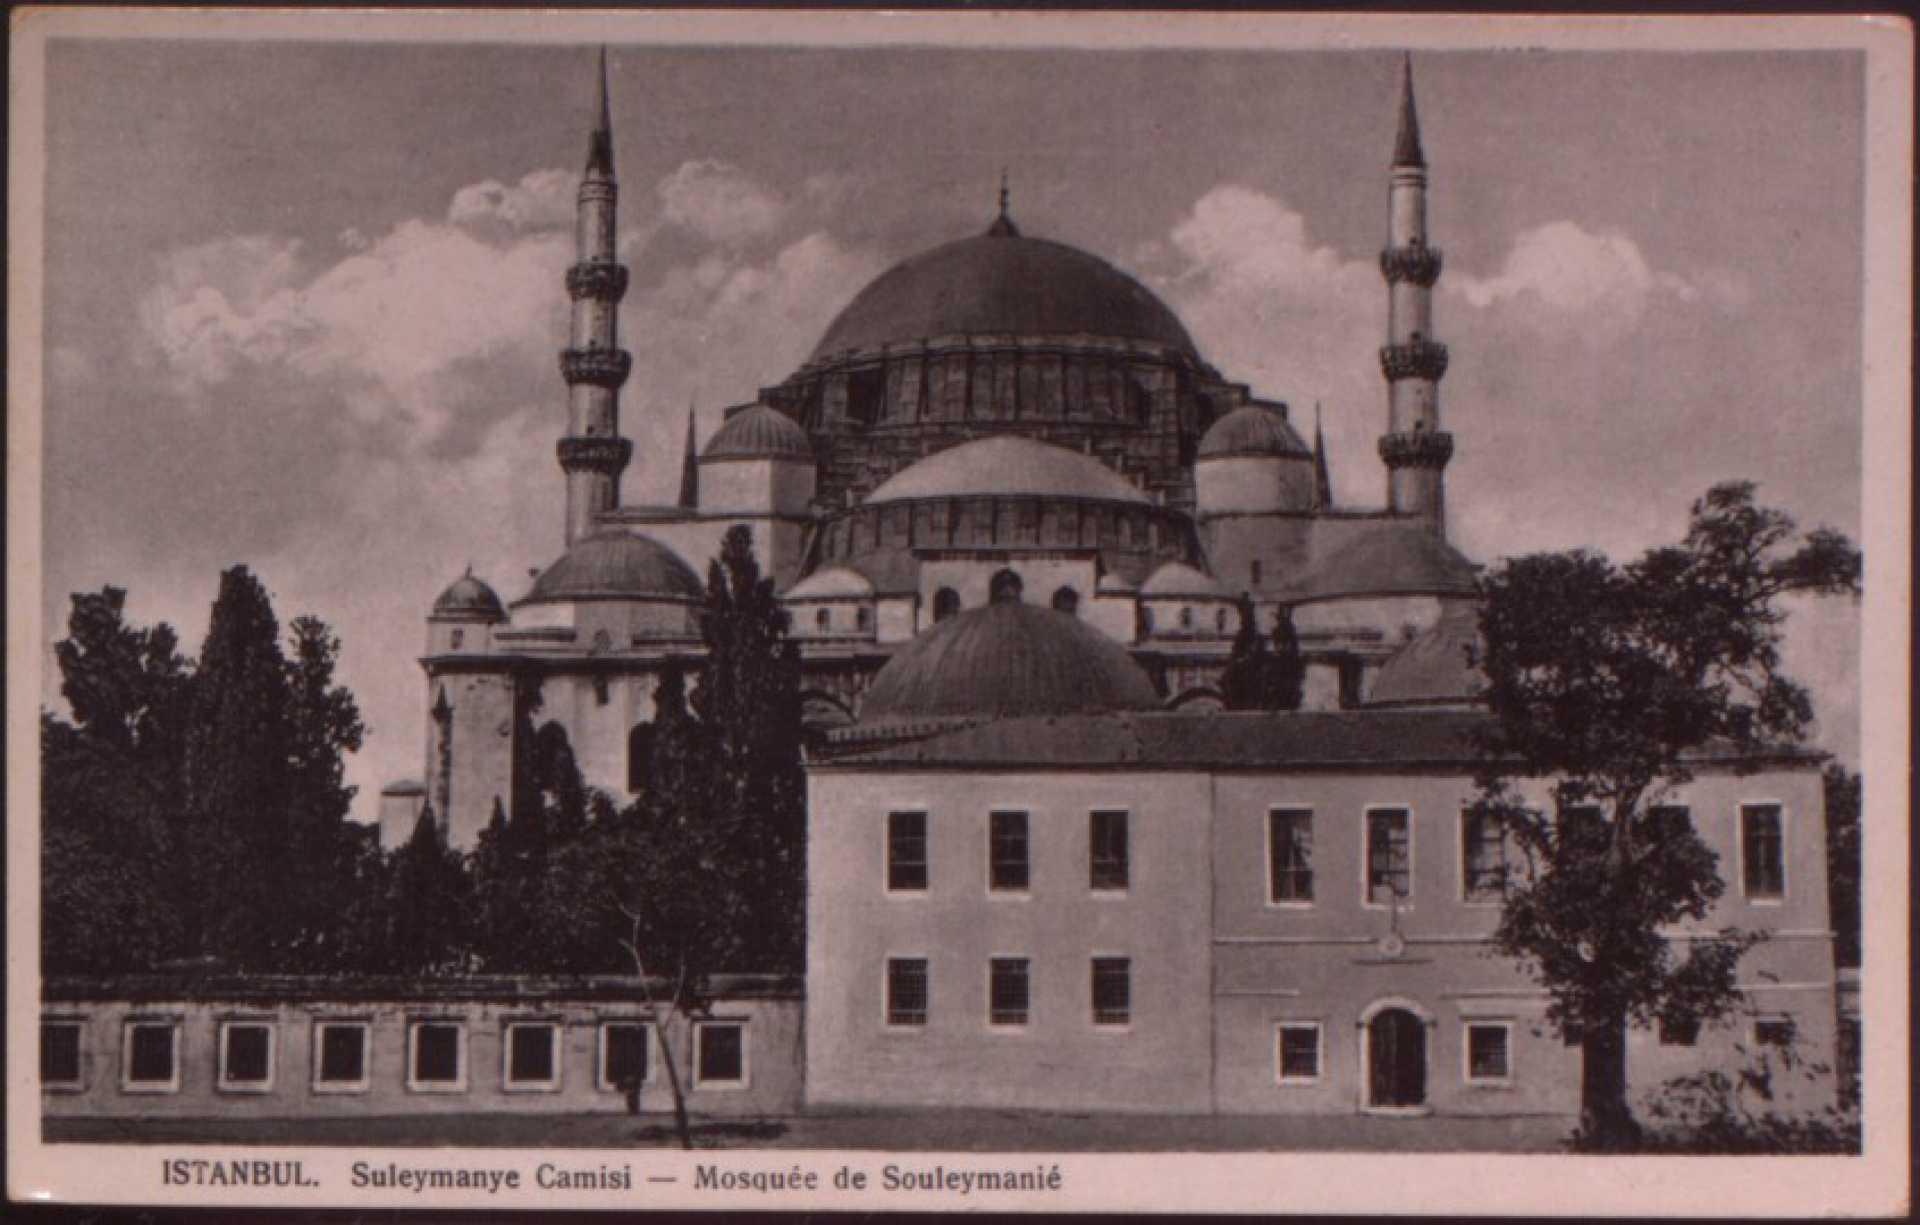 Süleymaniye Camii – Mosquee de Souleymanie